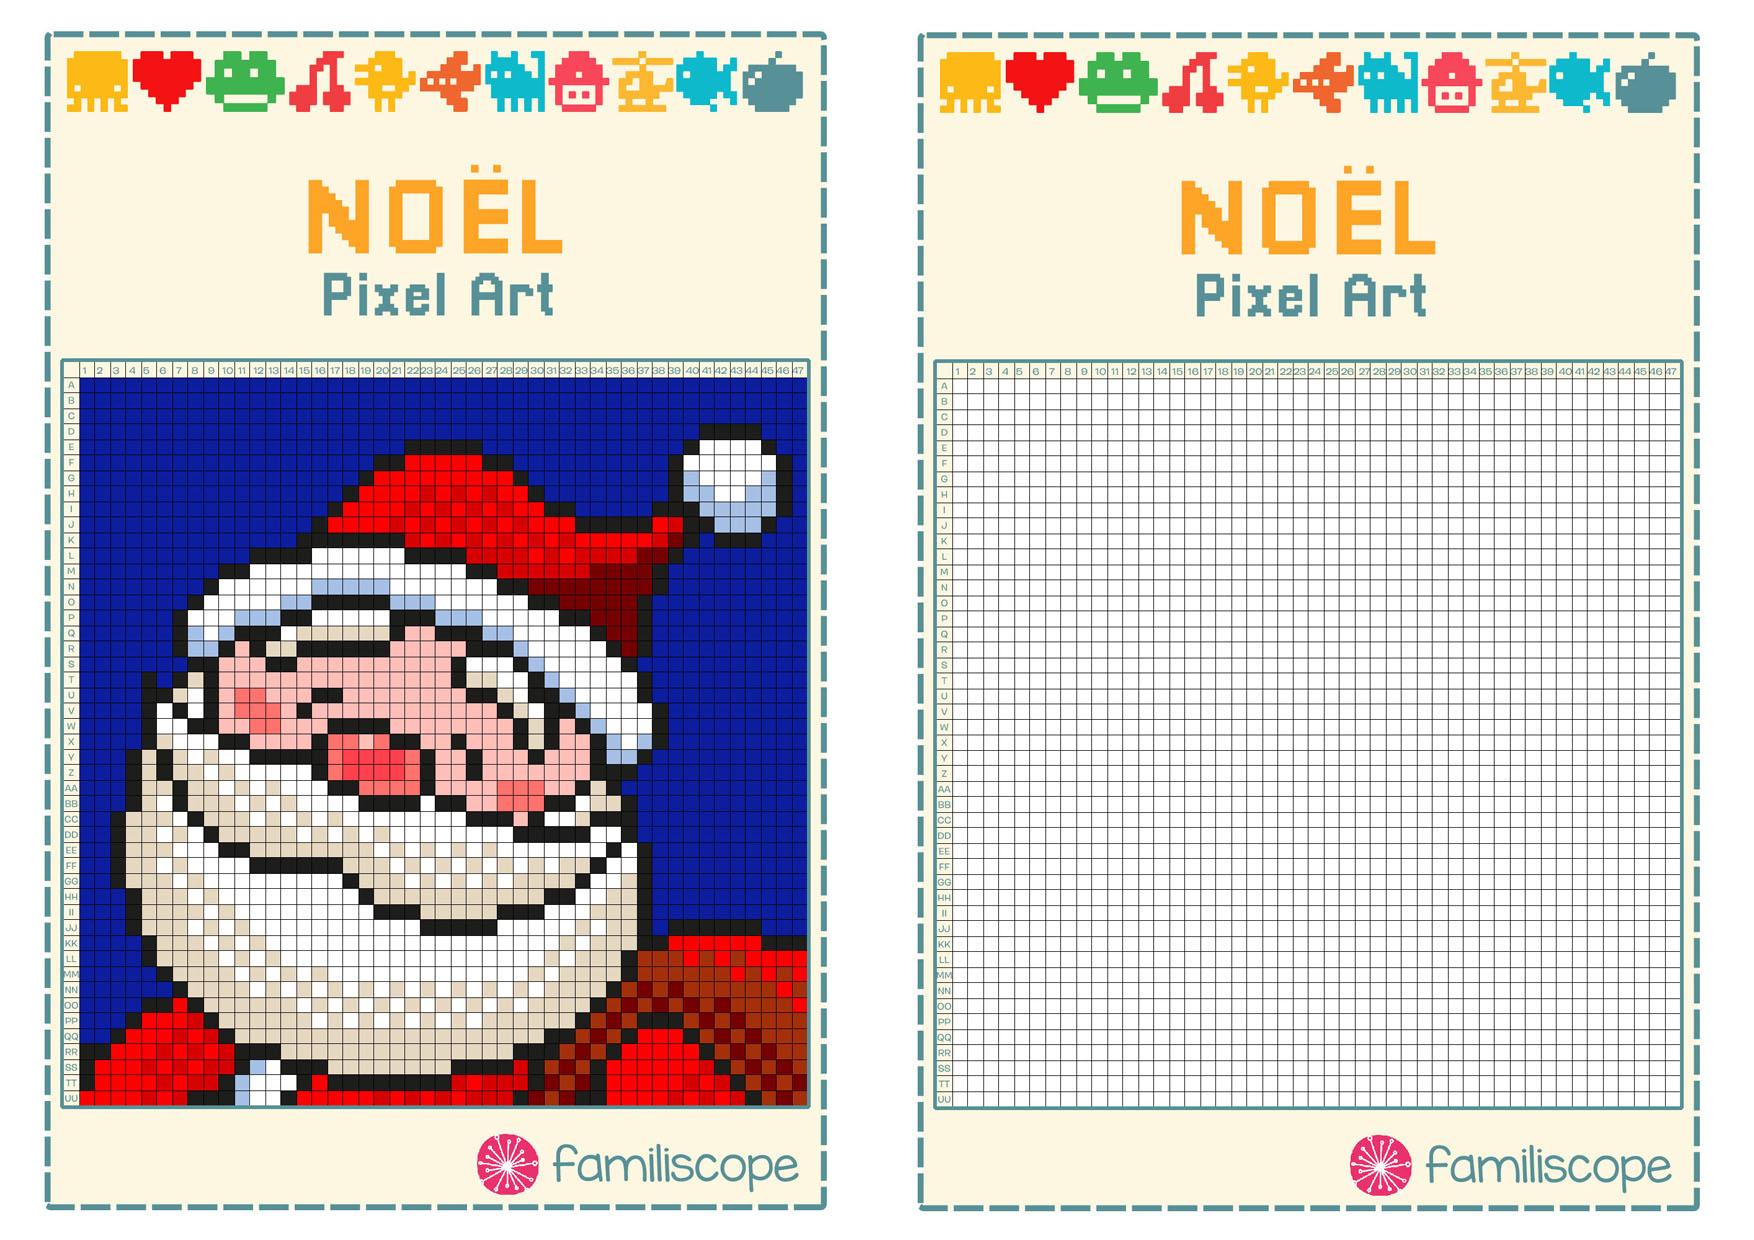 Pixel Art Noël : Tête De Père Noël tout Pixel Art Pere Noel